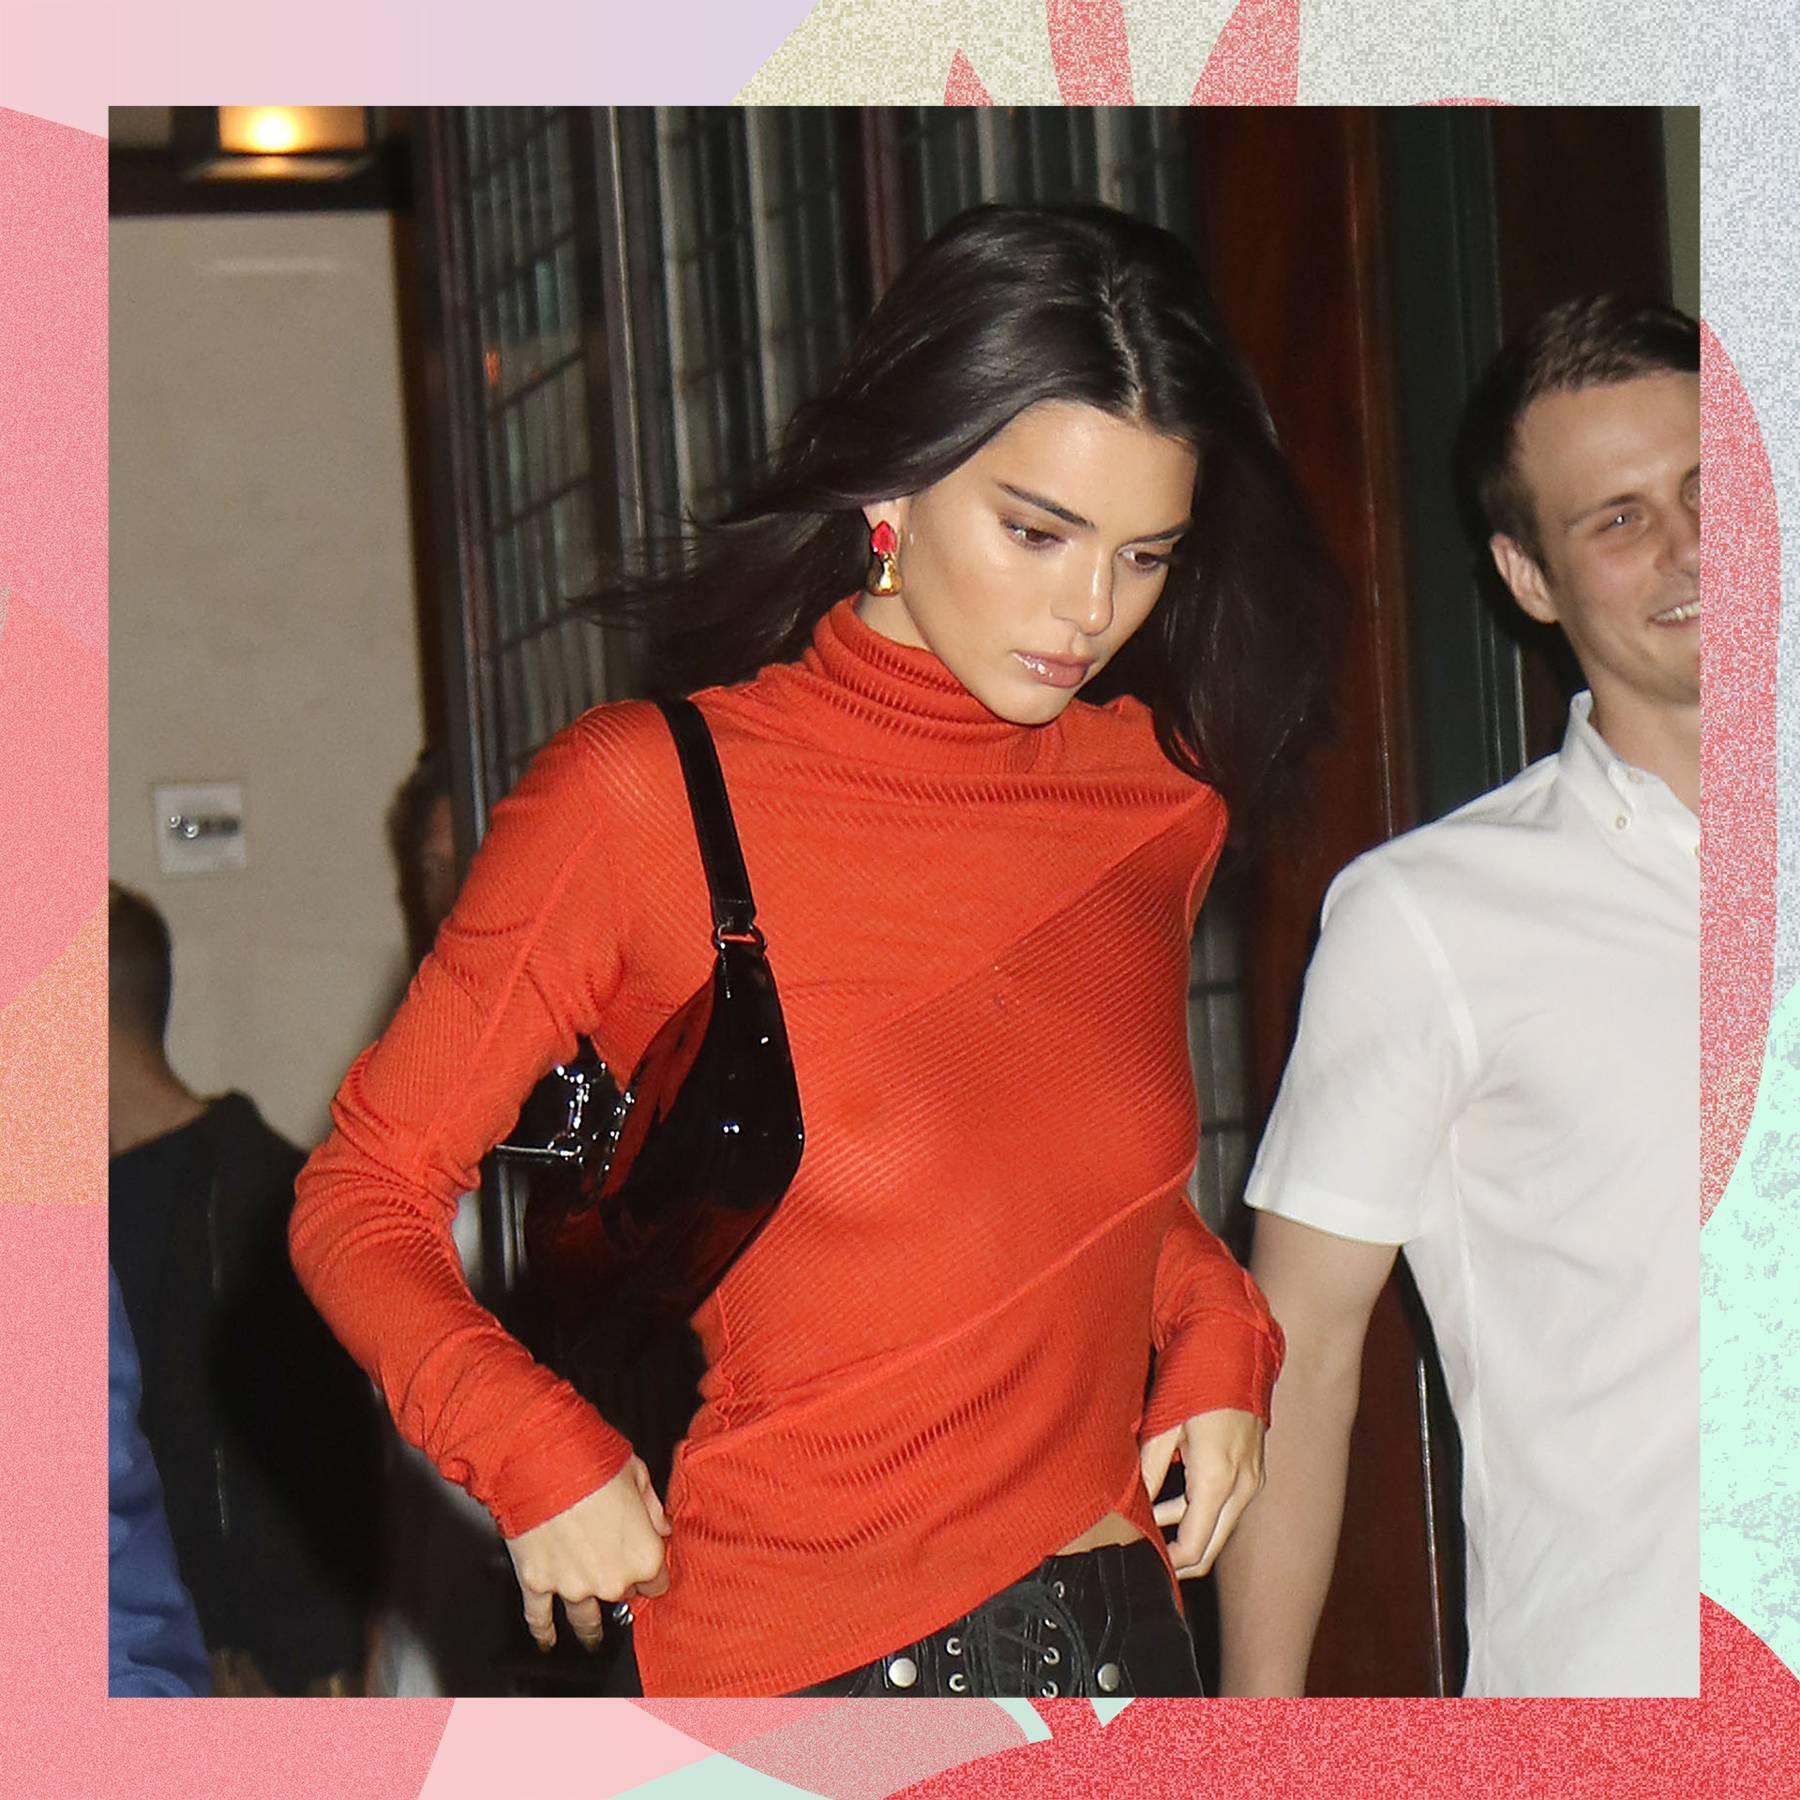 de34edabf68d Winter Outfits 2018: Celebrity Fashion Street Style | Glamour UK